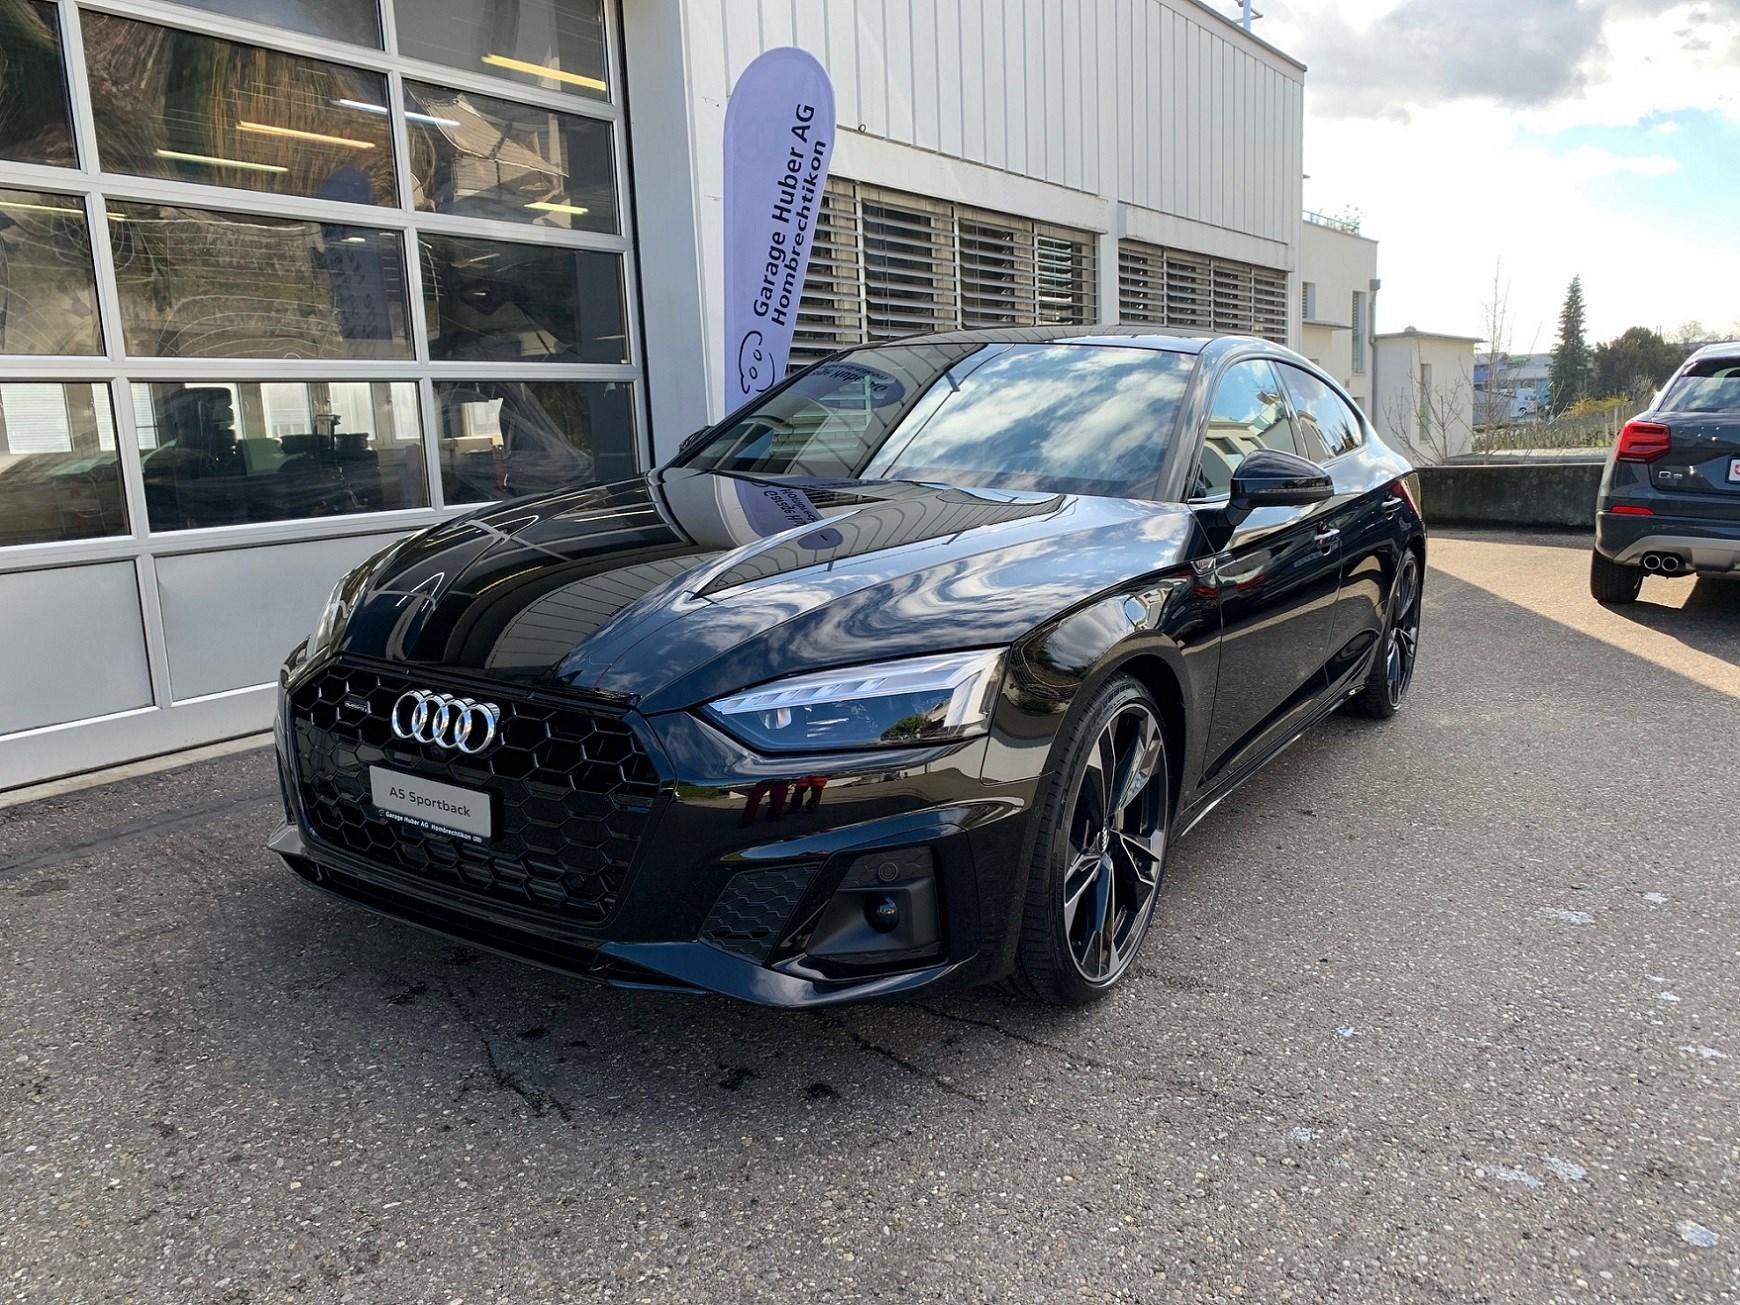 Buy New Car Sedan Audi A5 Sportback 45 Tfsi S Tronic Quattro 11 Km At 79800 Chf On Carforyou Ch